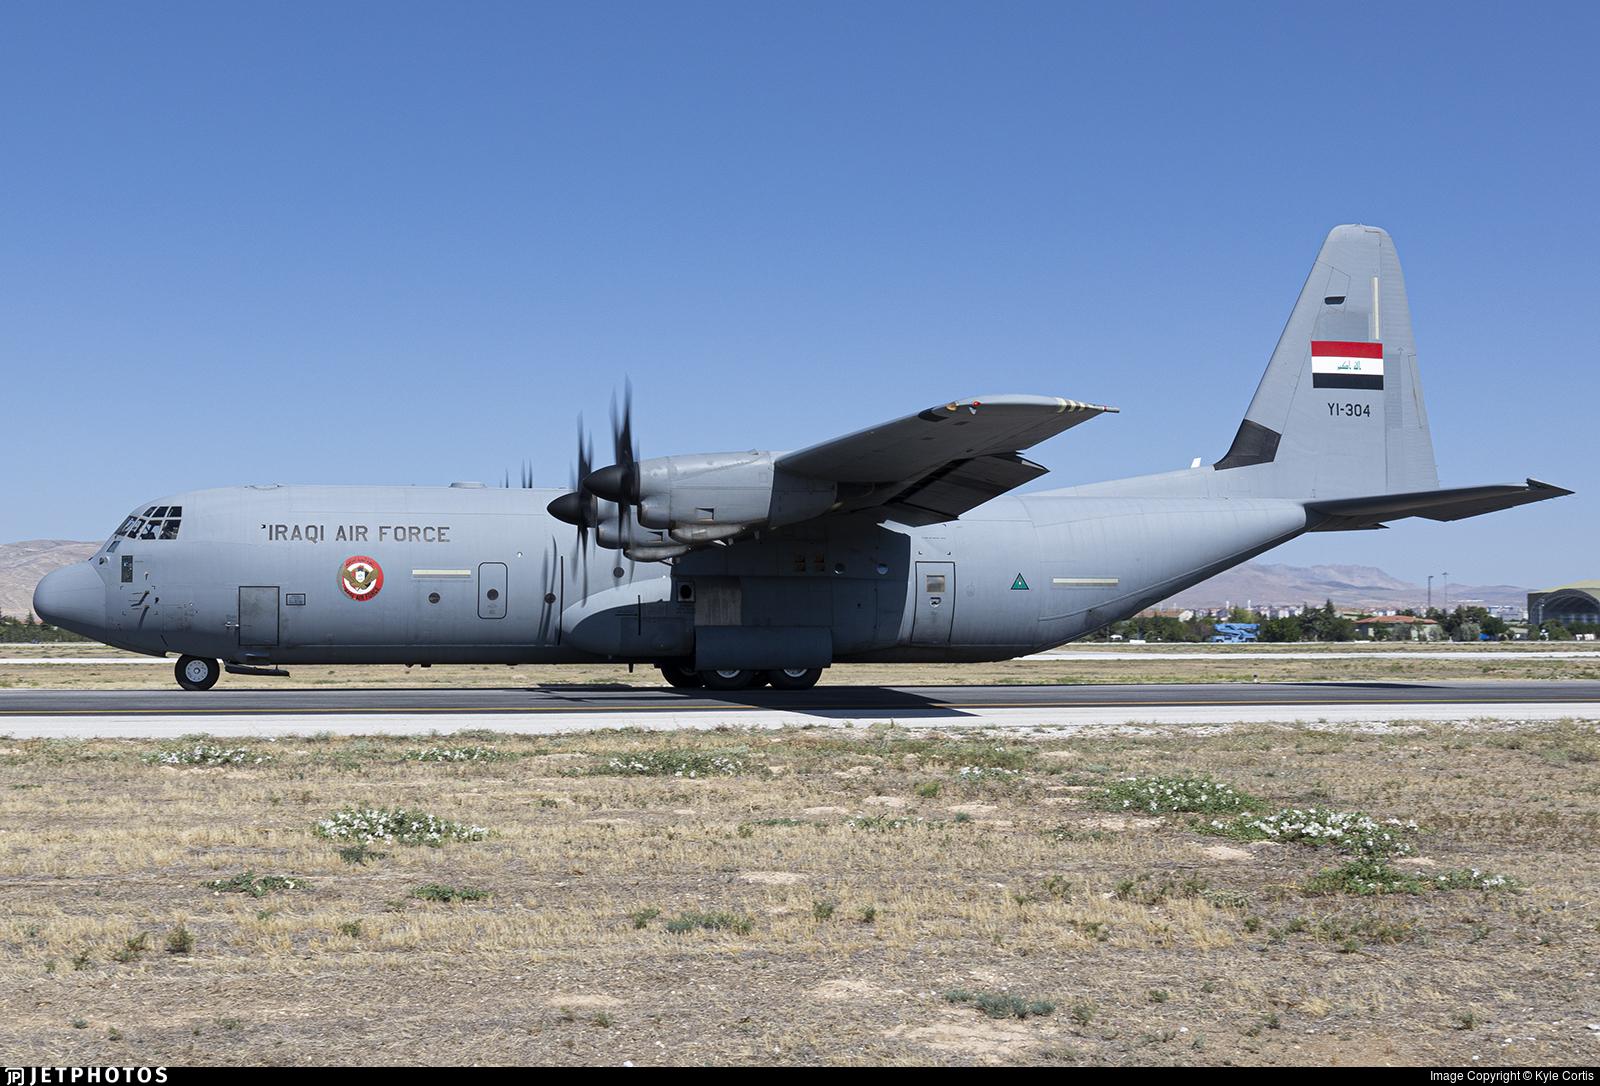 YI-304 - Lockheed Martin C-130J-30 Hercules - Iraq - Air Force